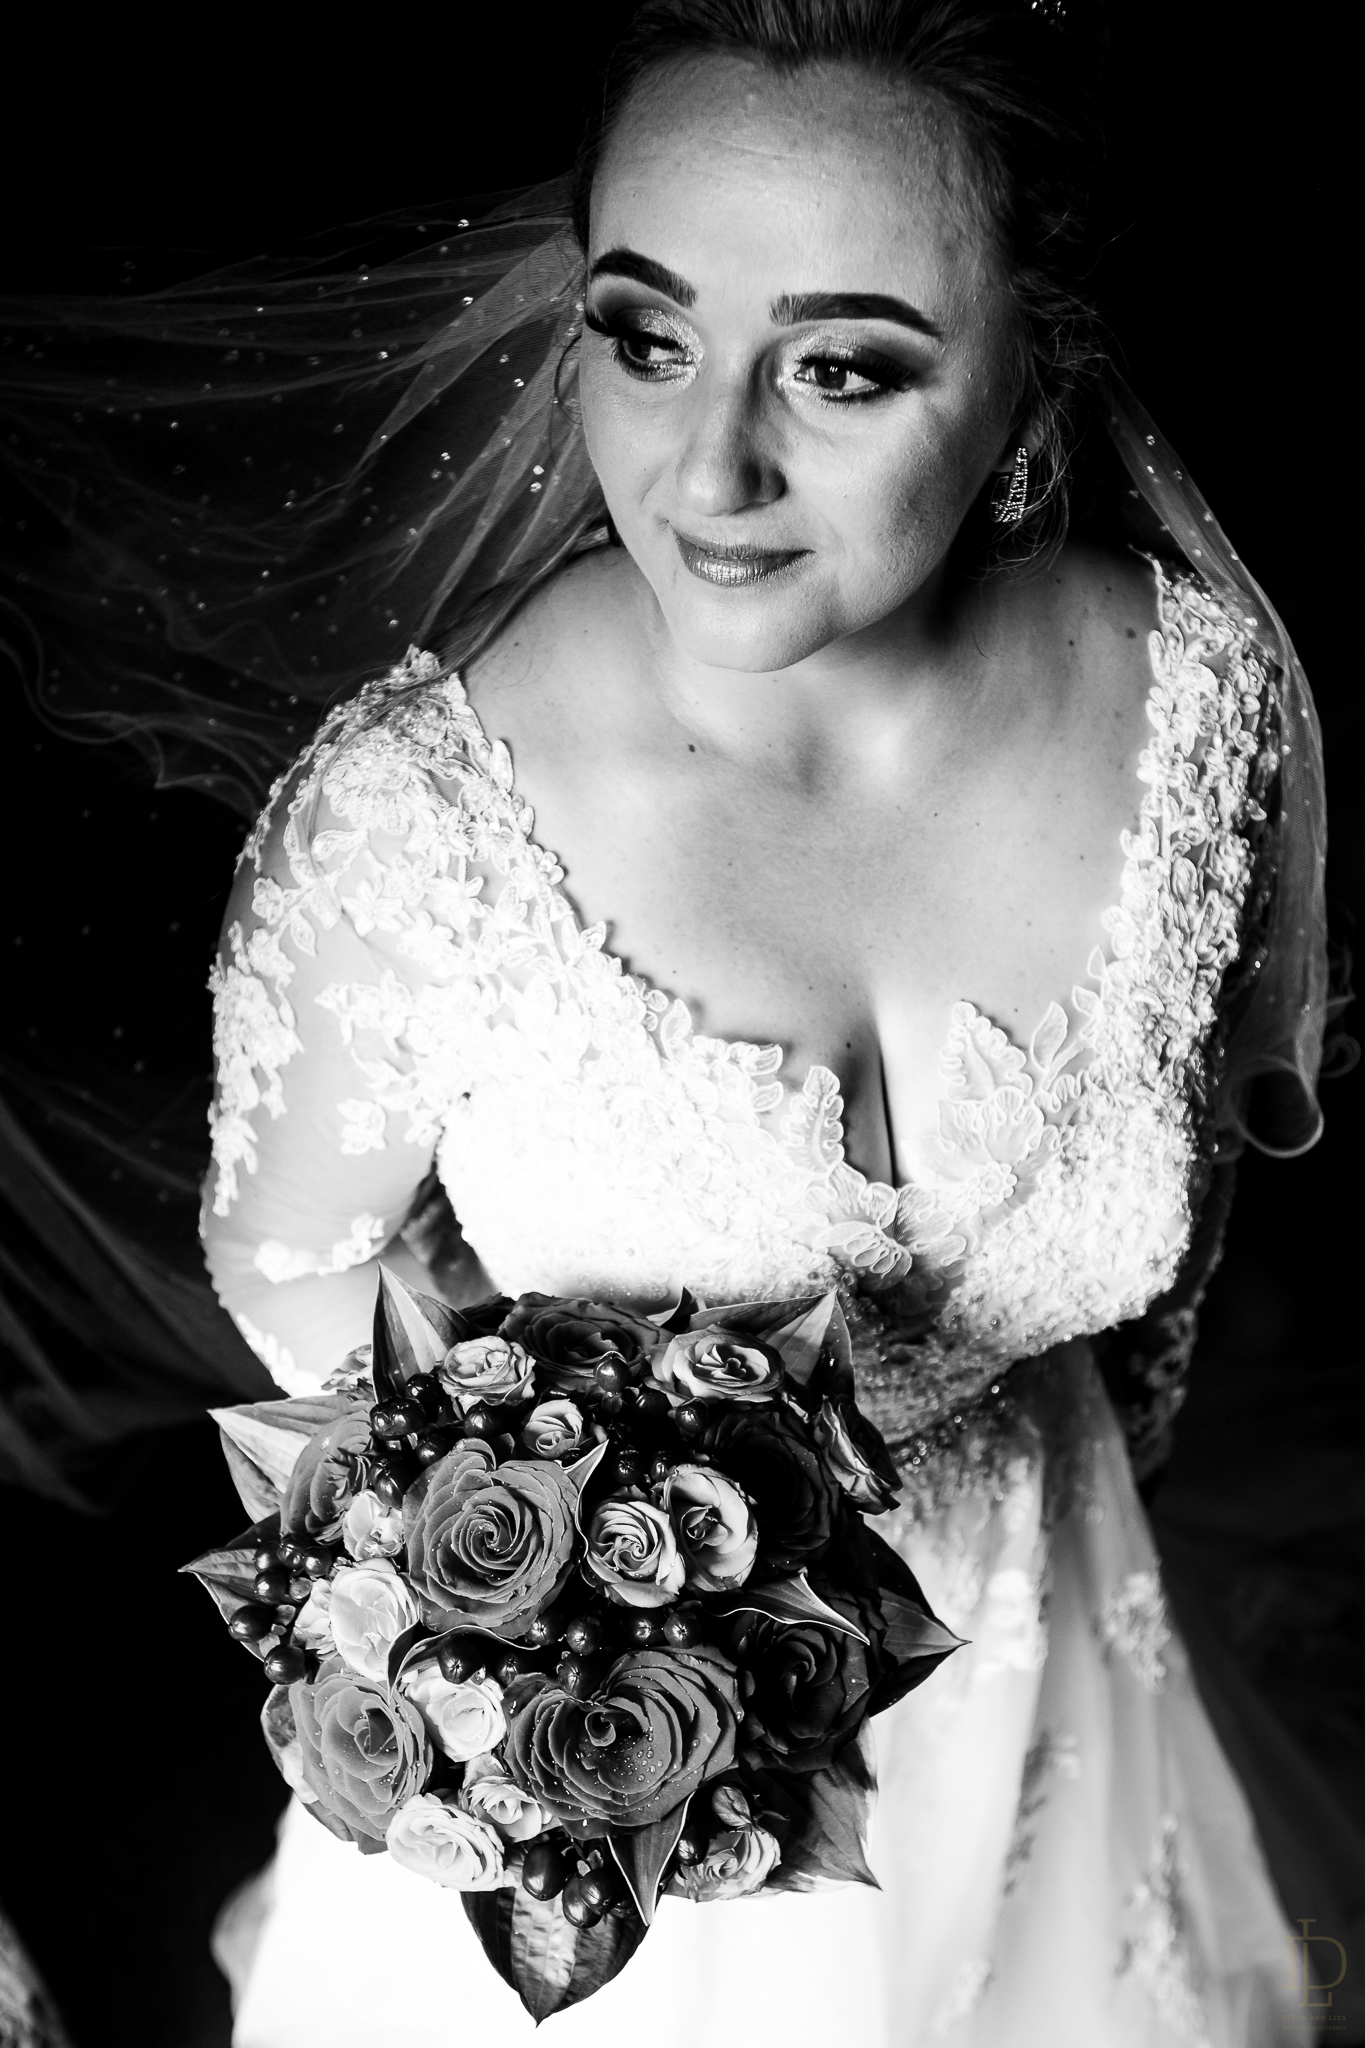 old-mill-wedding-toronto-photographer-17.jpg